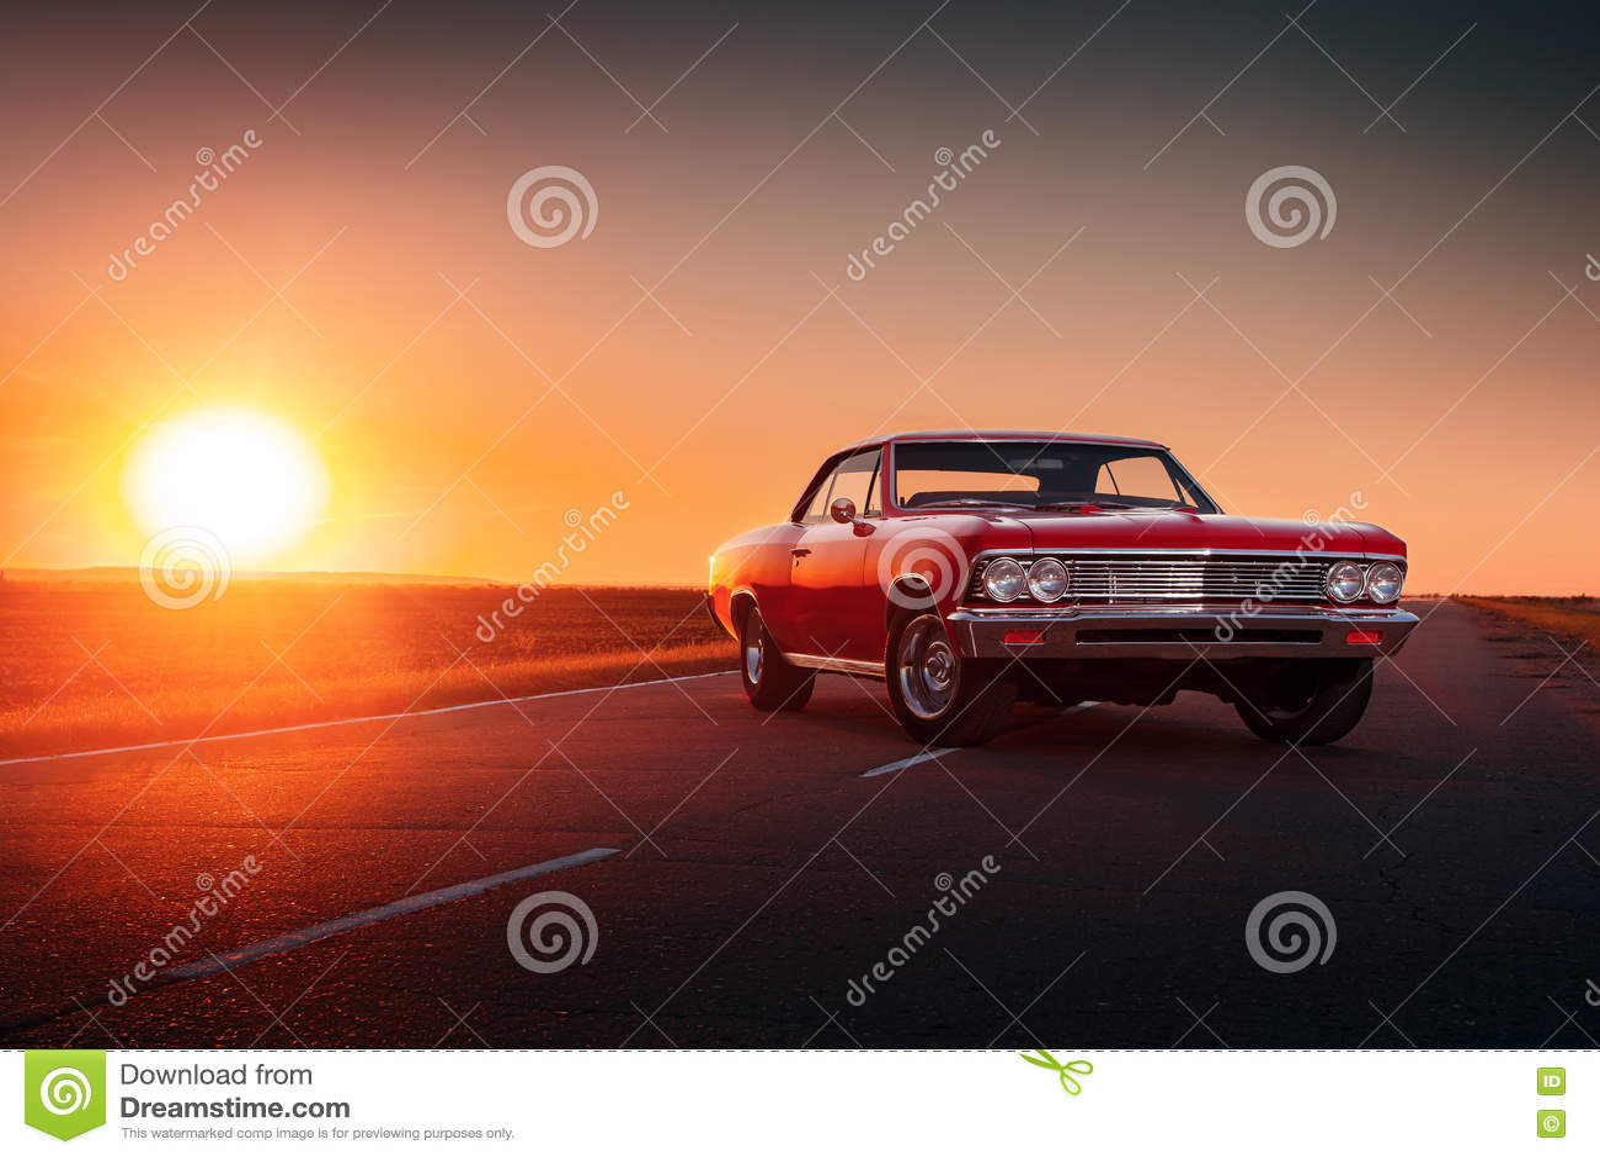 Retro red car standing on asphalt road at sunset